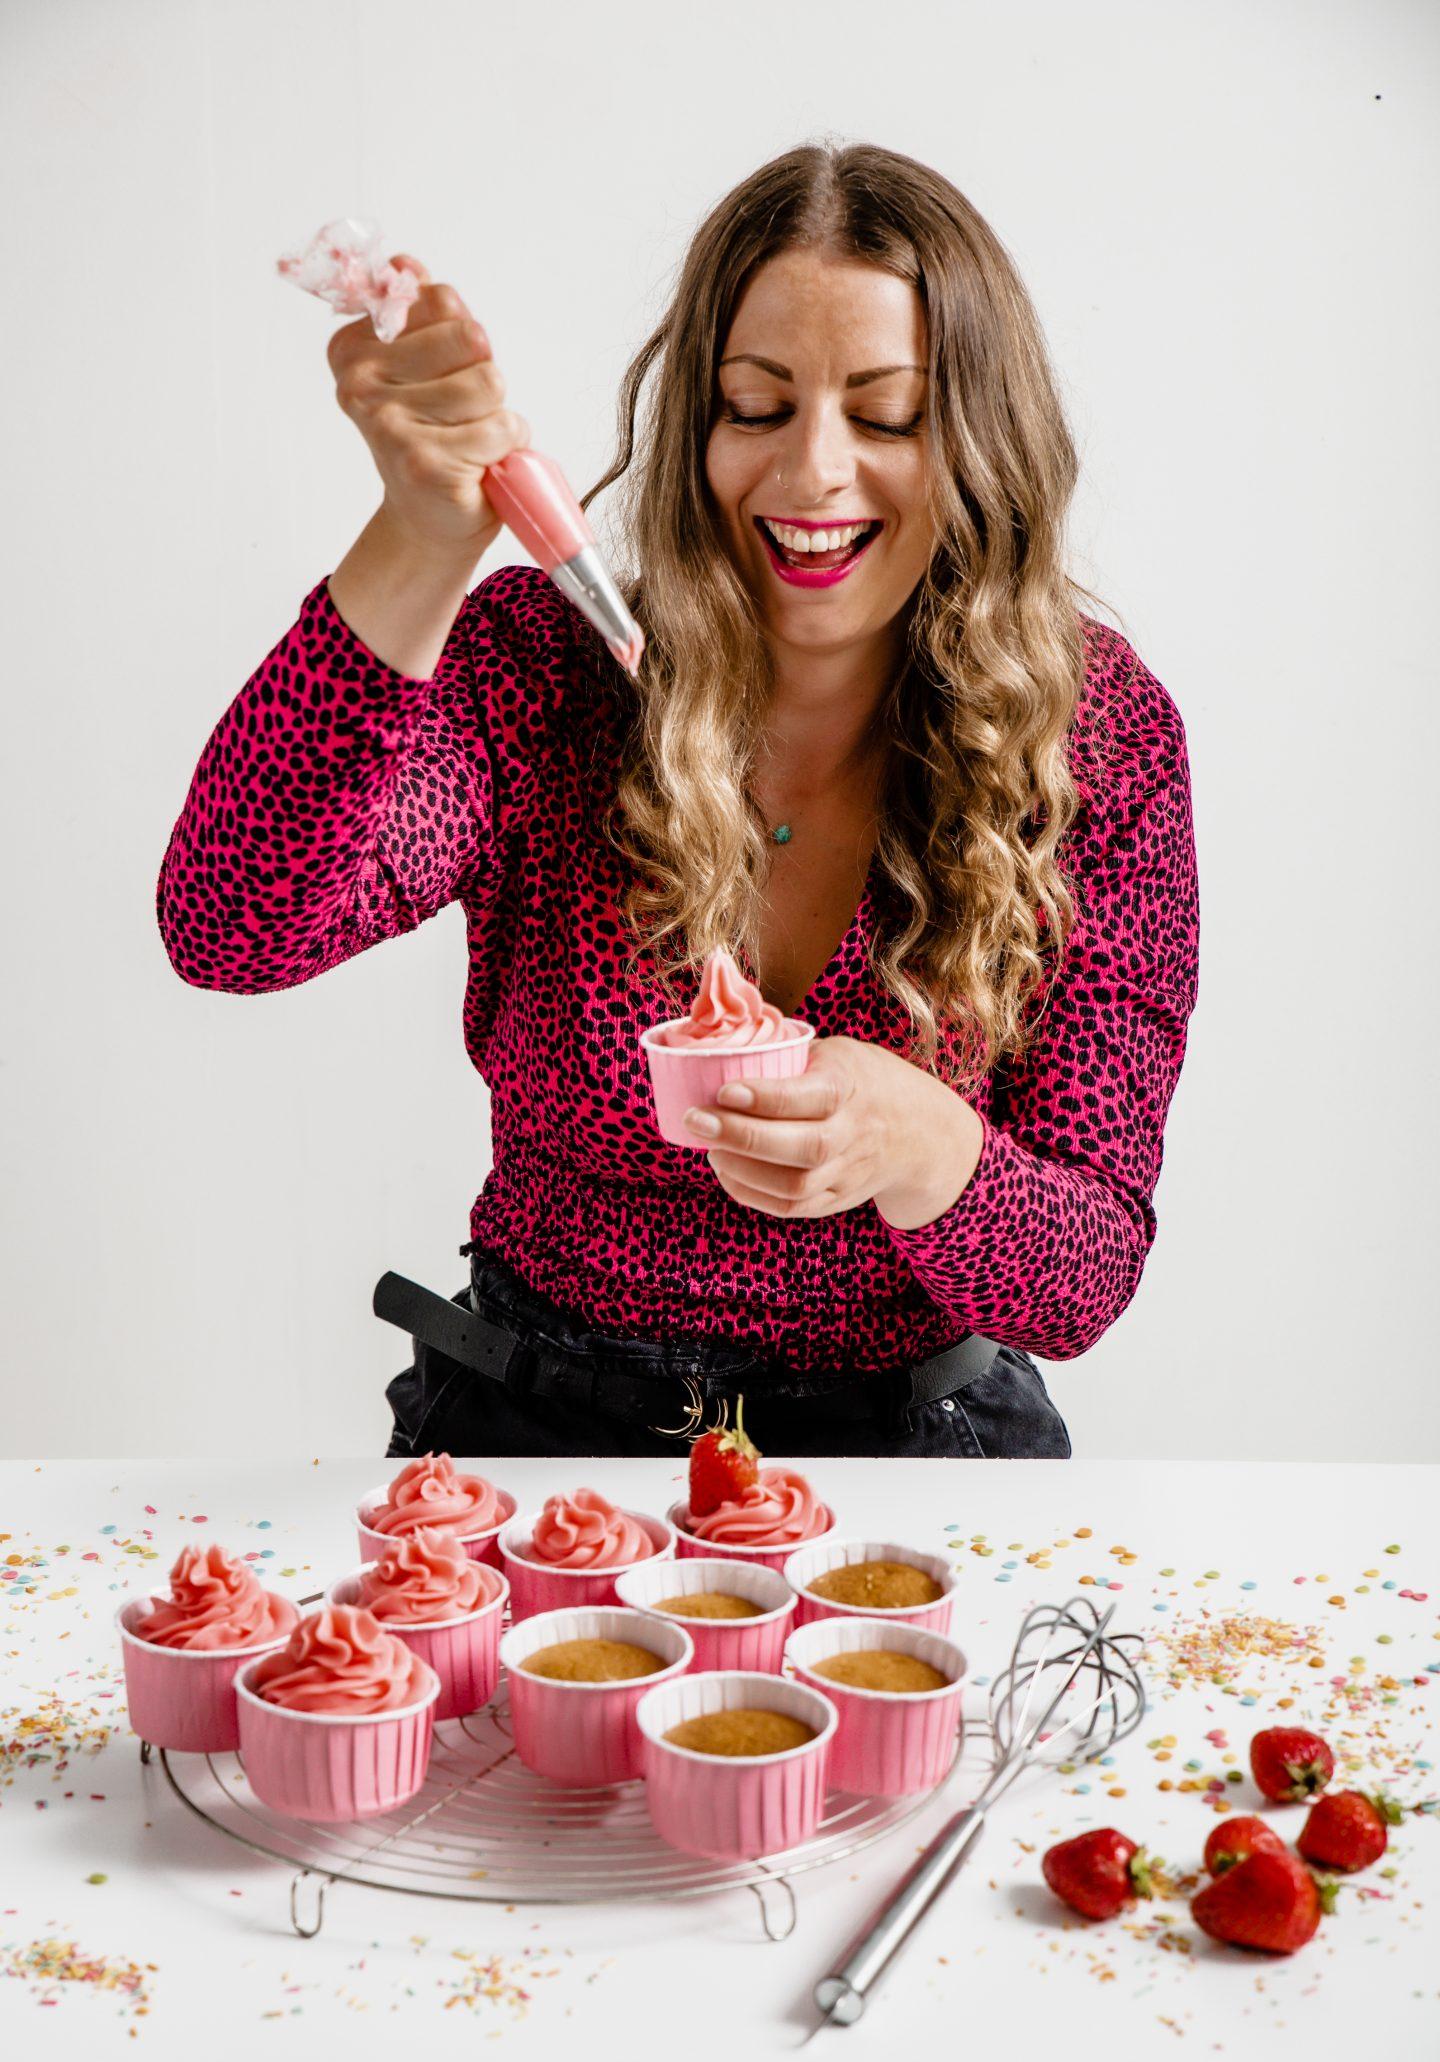 sarah howells the gluten free blogger